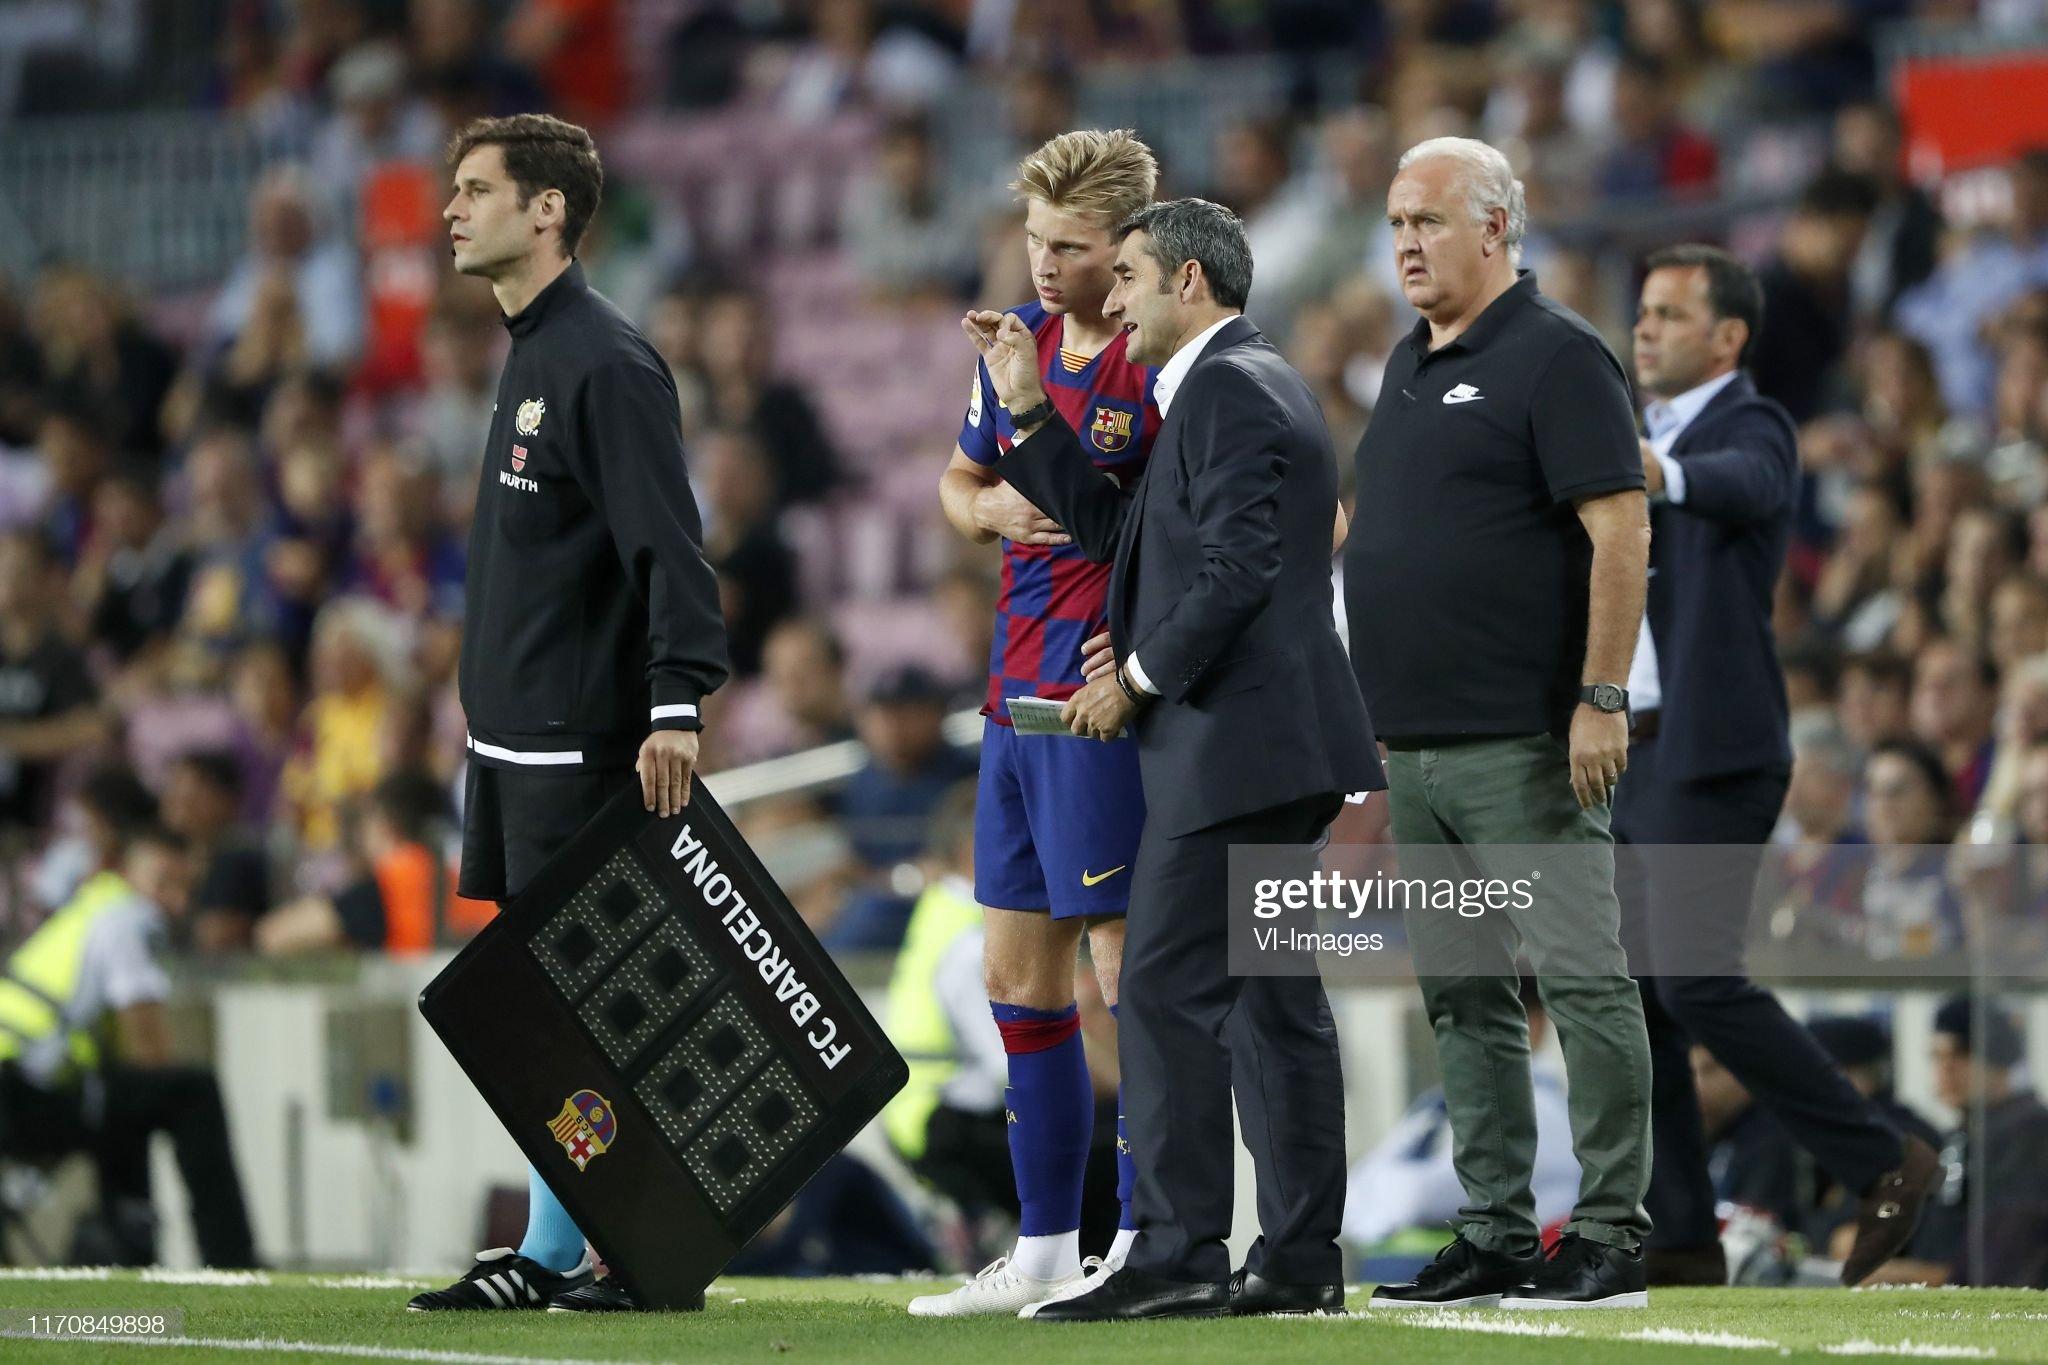 صور مباراة : برشلونة - فياريال 2-1 ( 24-09-2019 )  Frenkie-de-jong-of-fc-barcelona-fc-barcelona-coach-ernesto-valverde-picture-id1170849898?s=2048x2048